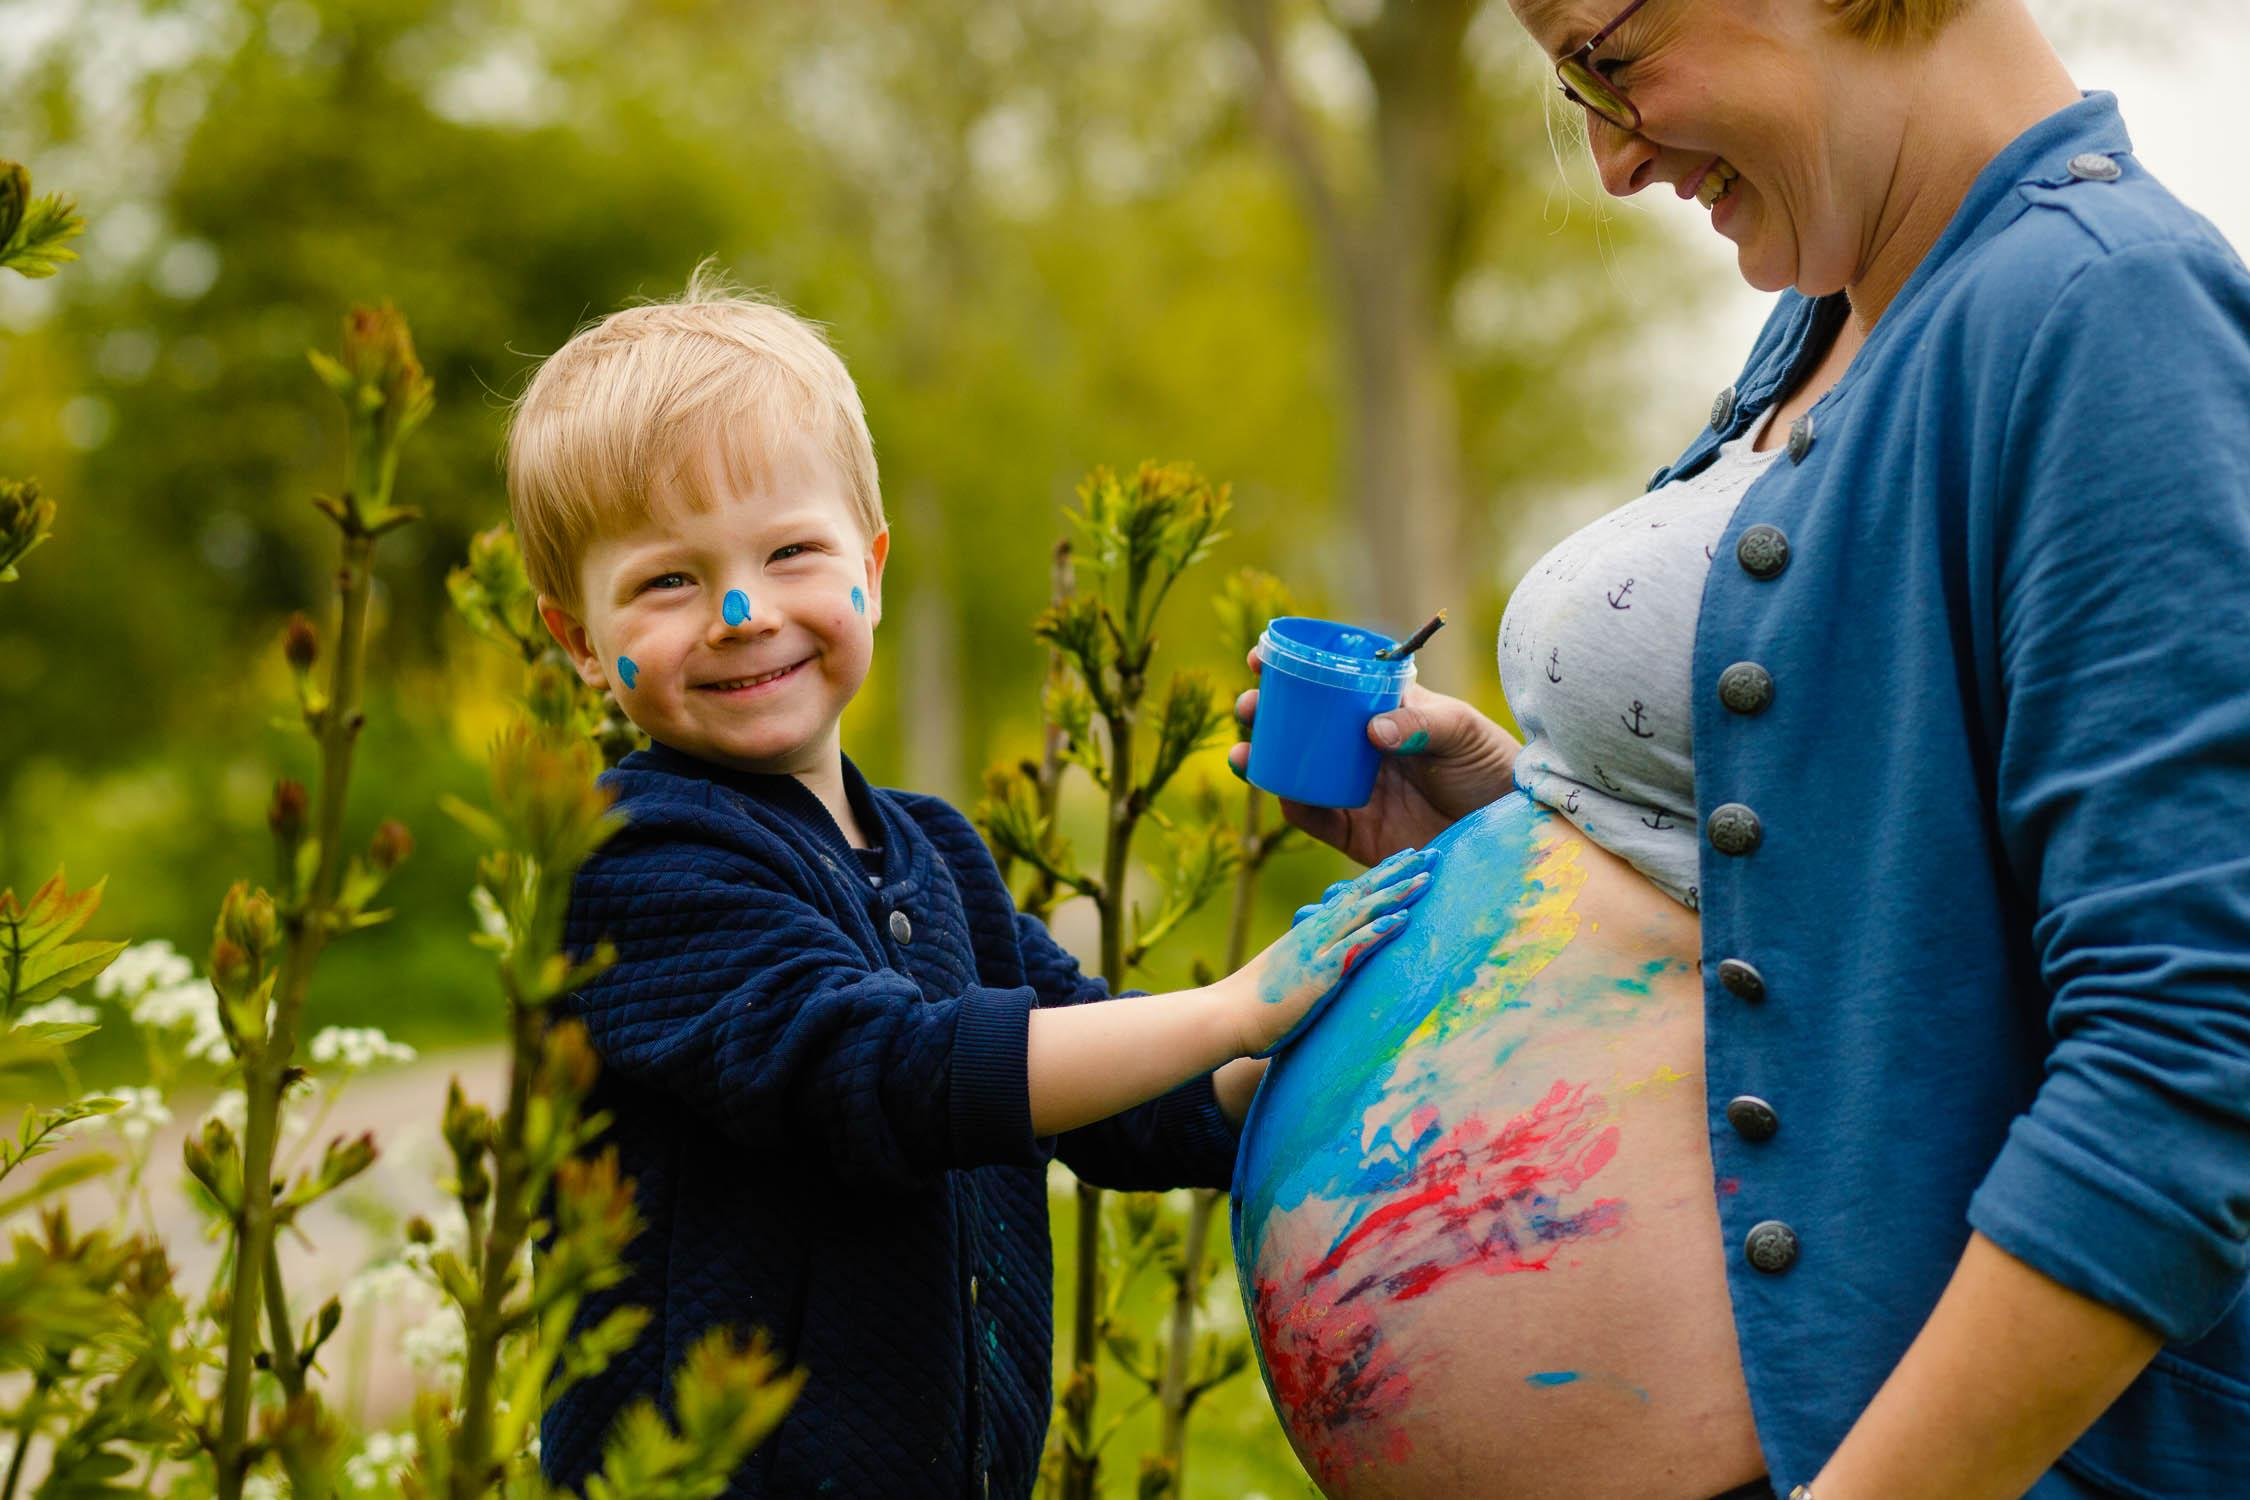 Babybauchshooting im Rapsfeld 21